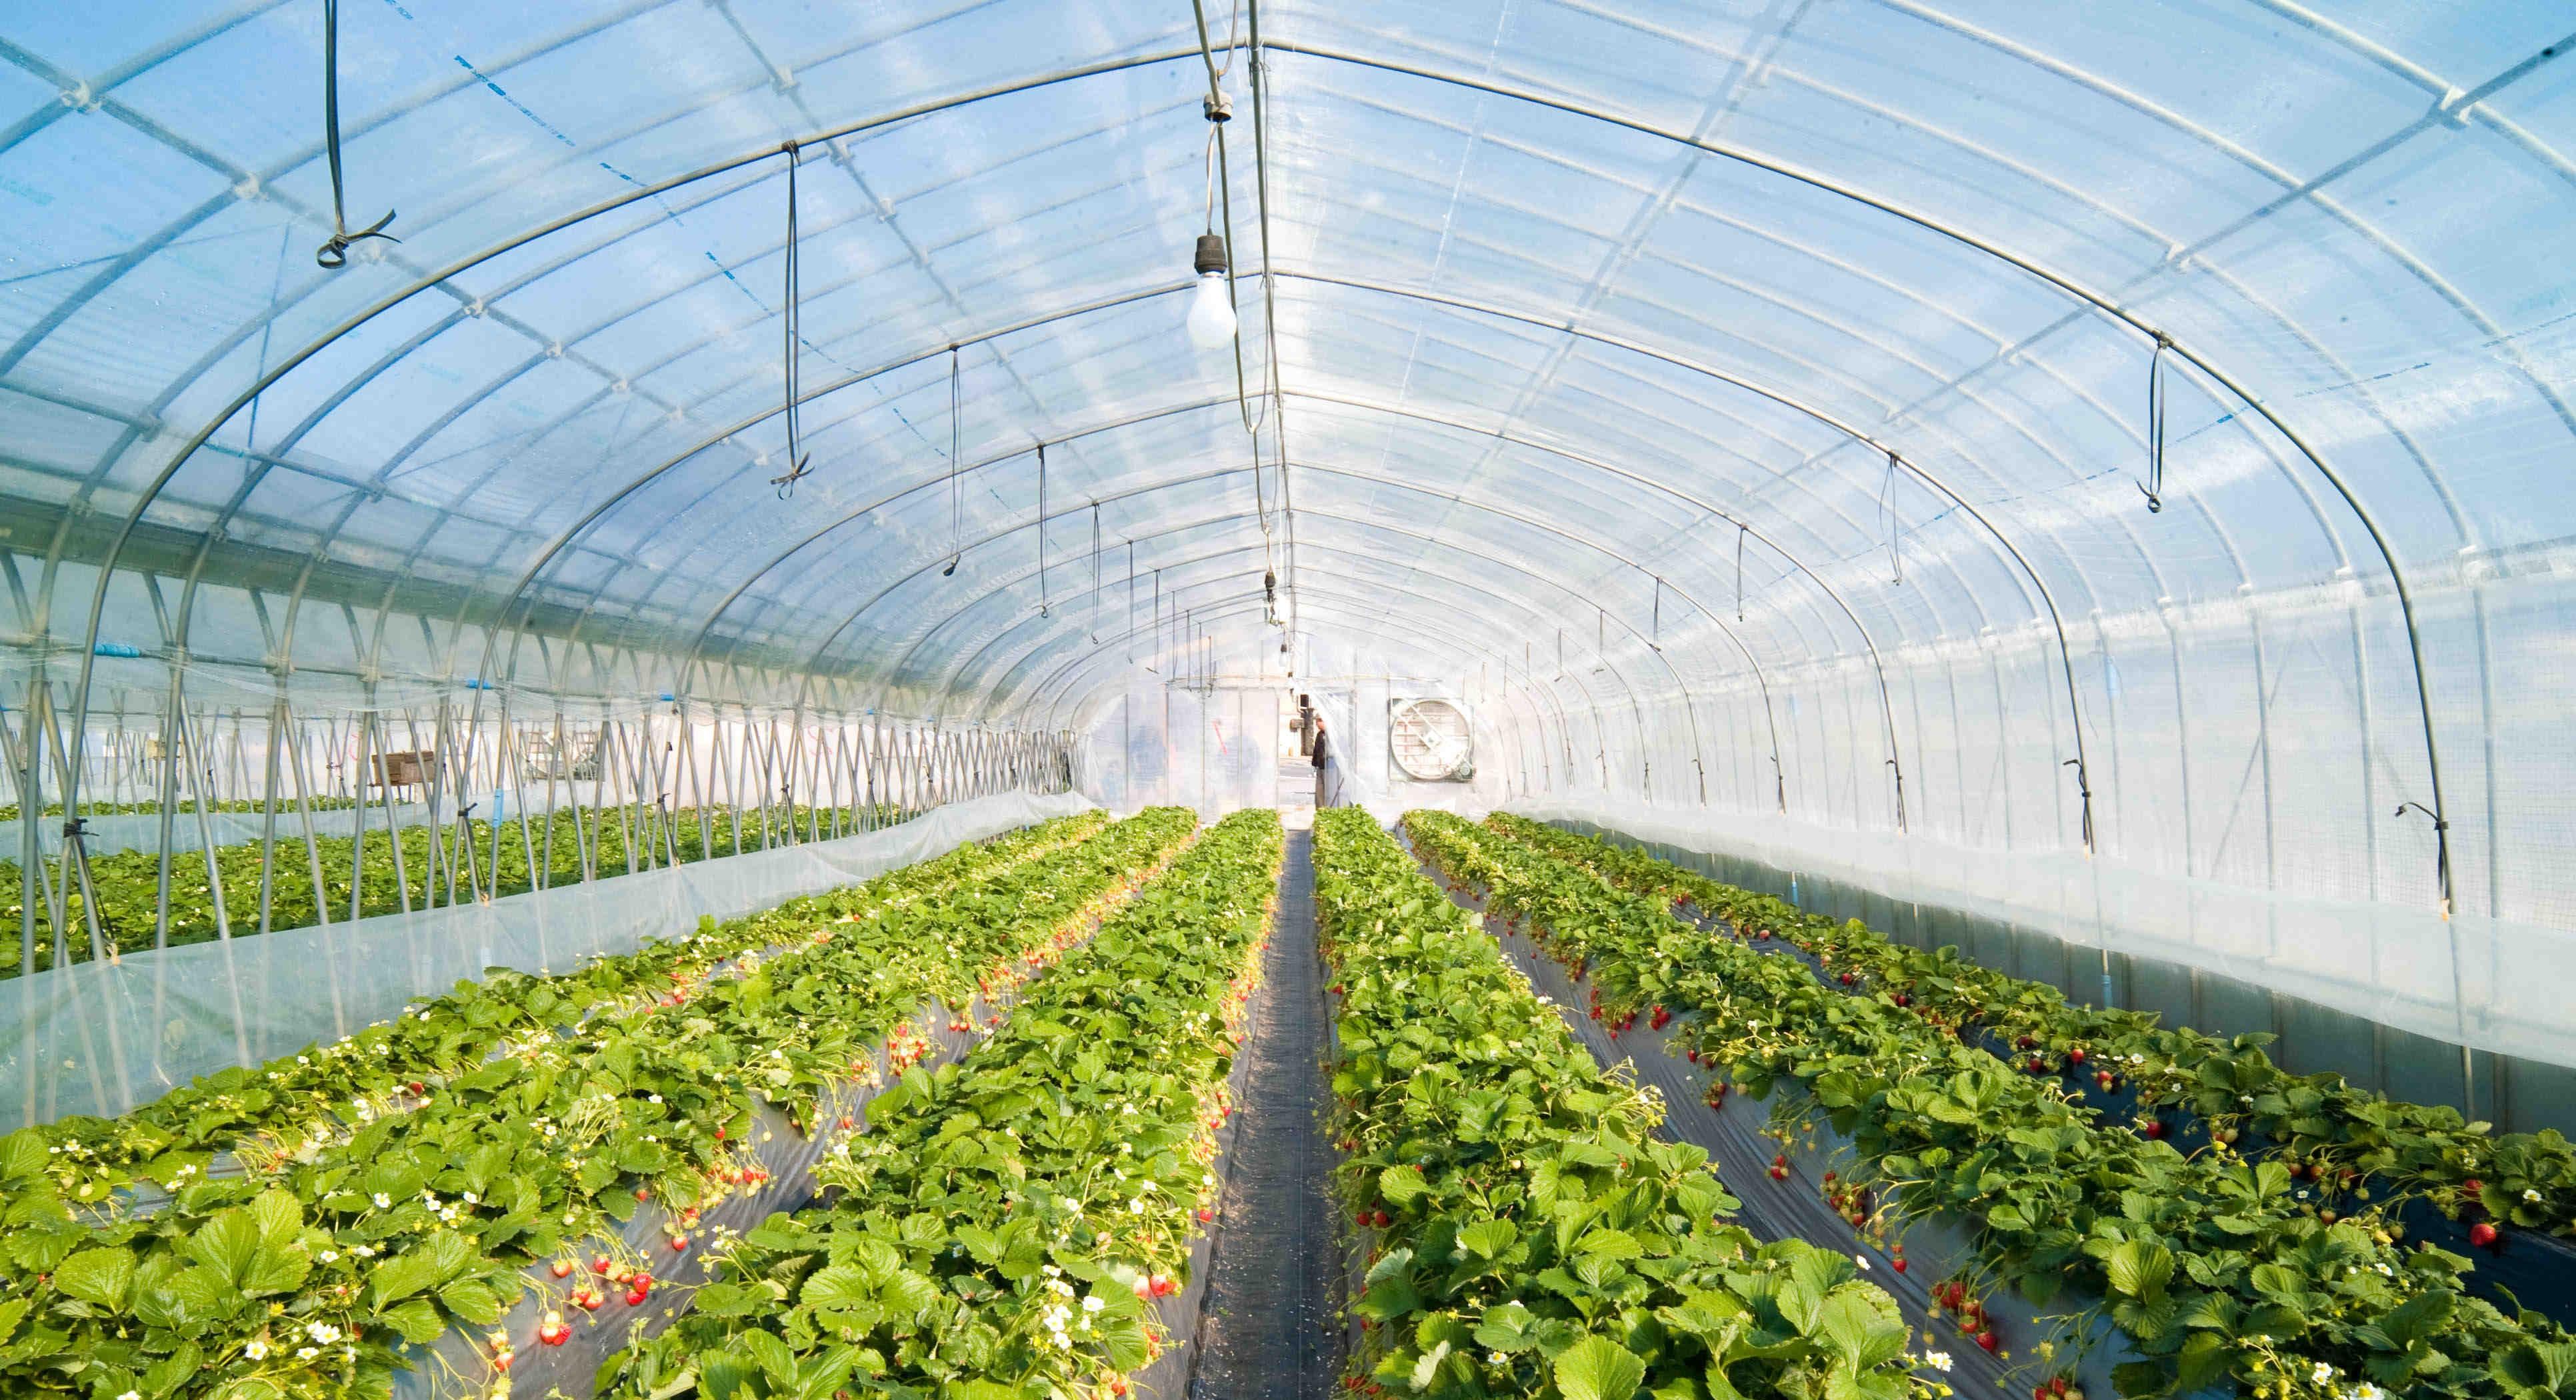 Estufas controlo ambiental gestão agrícola